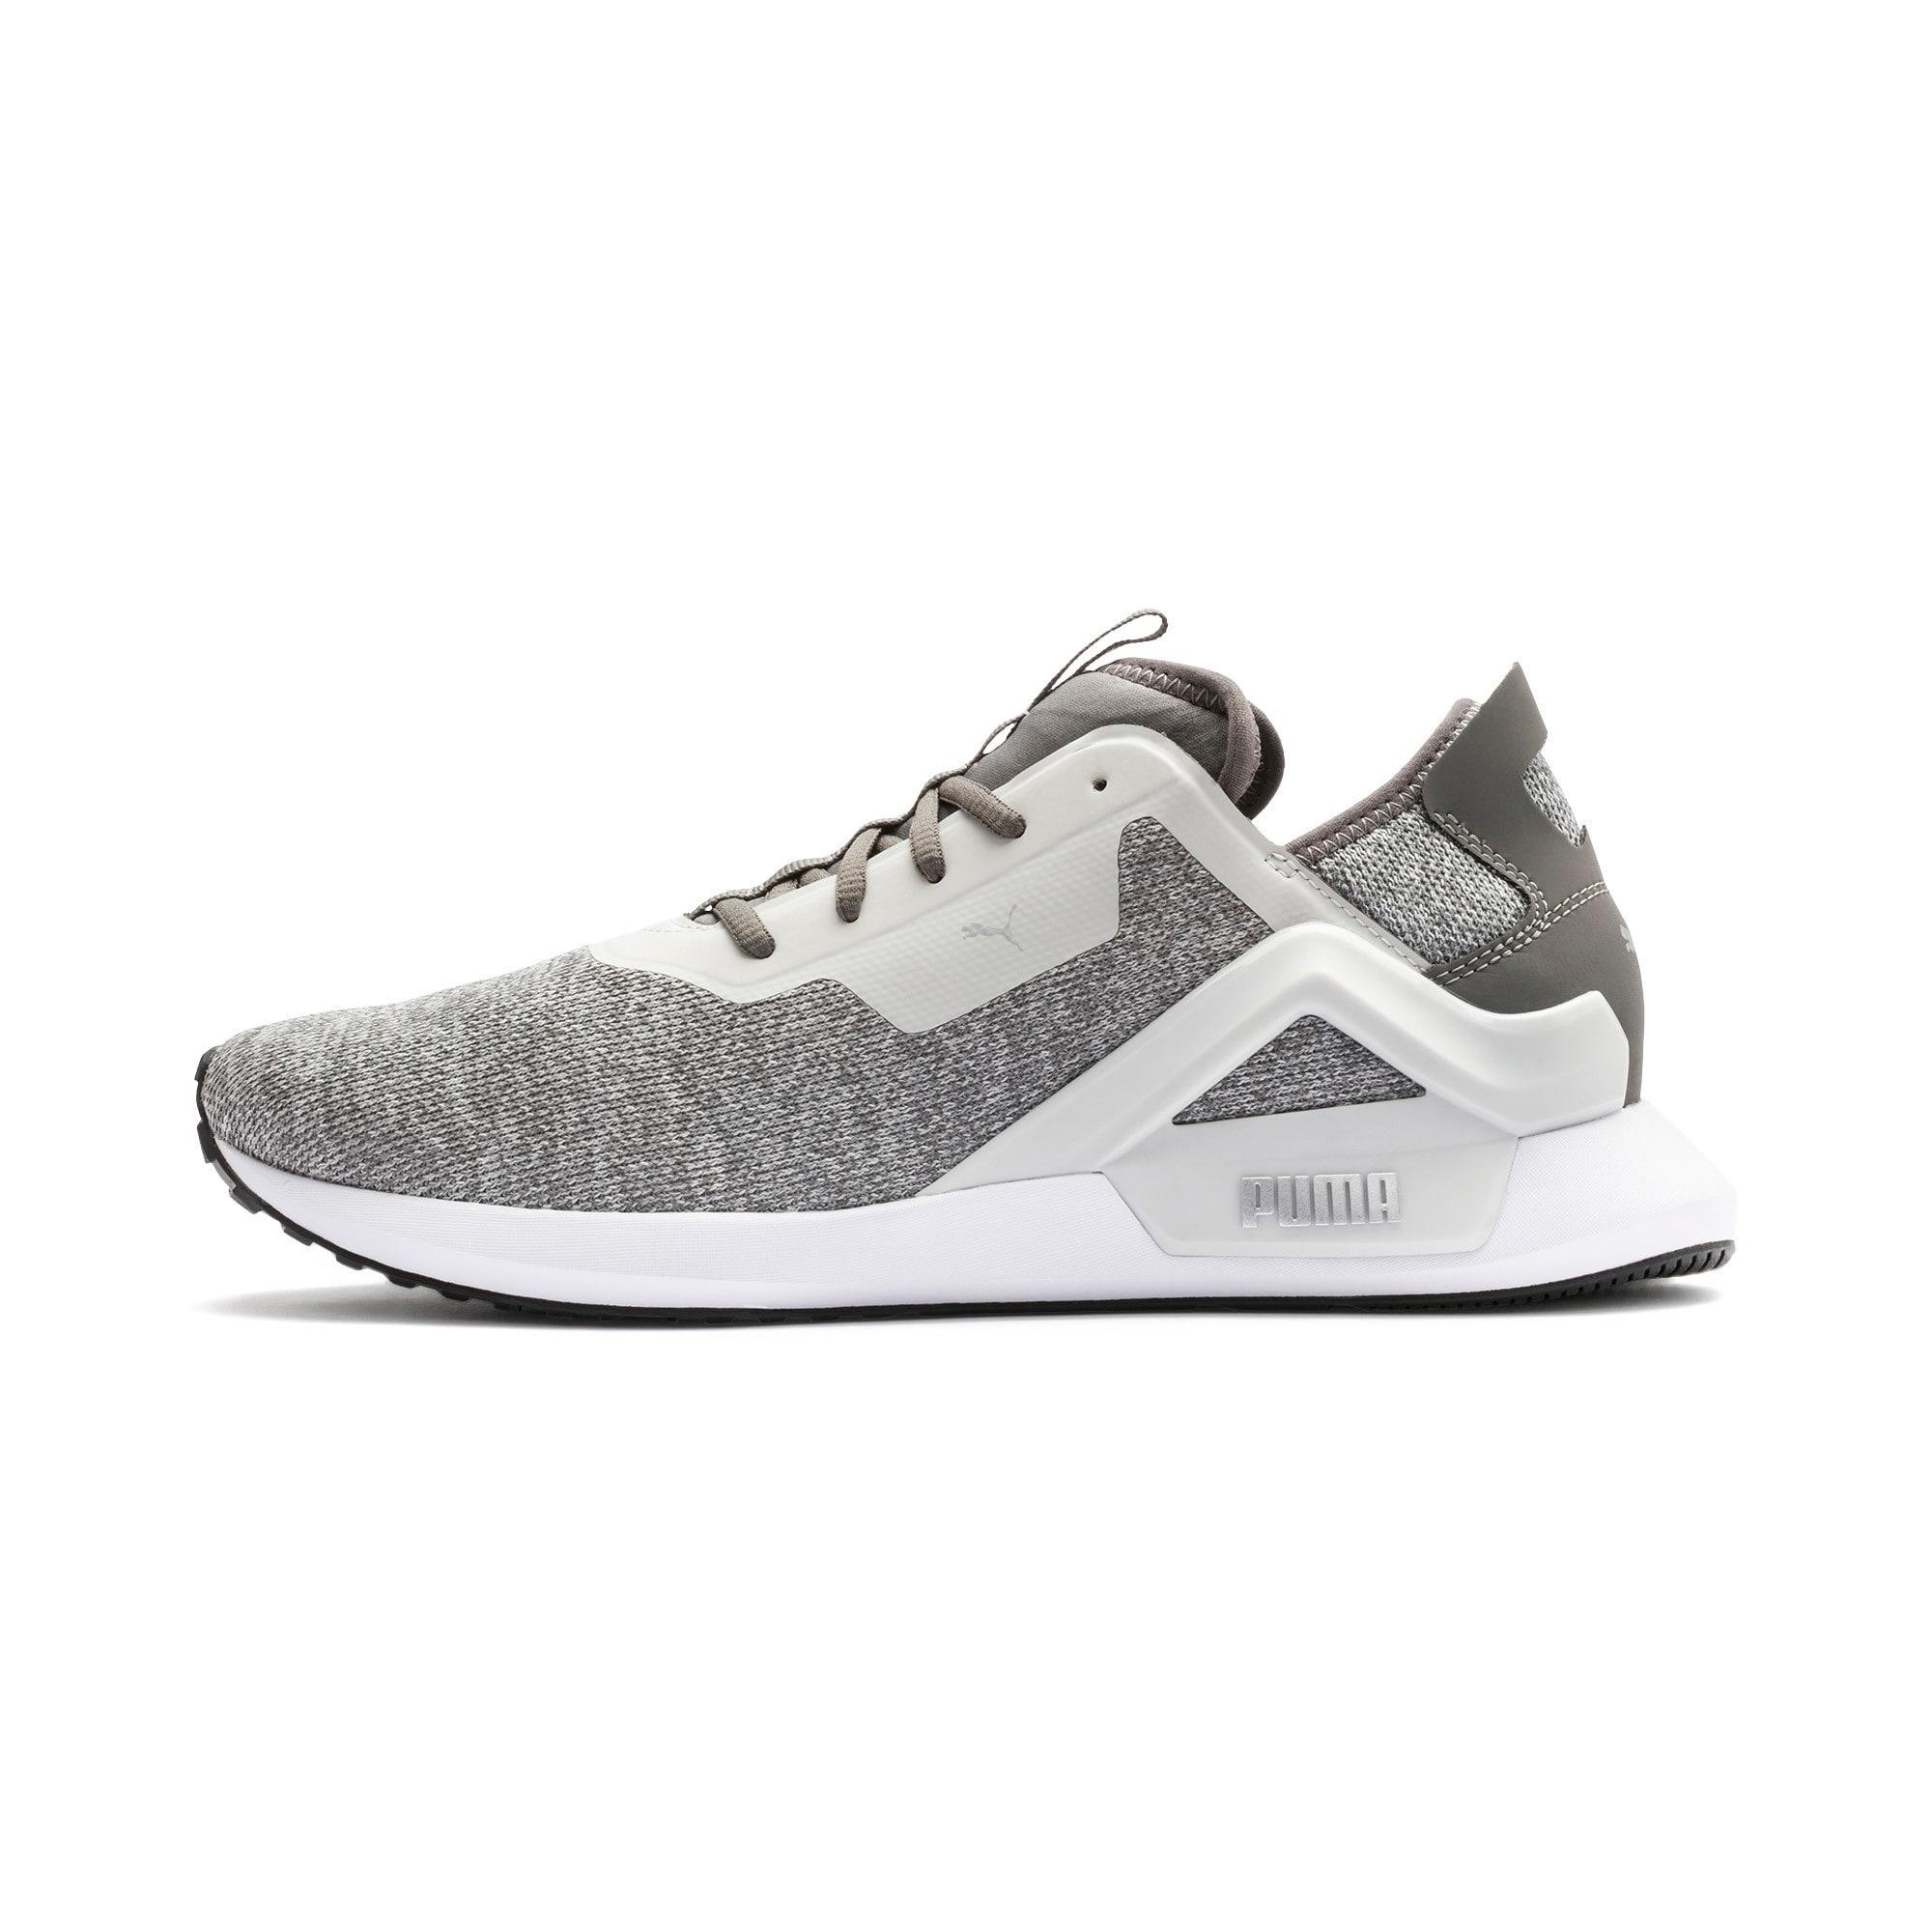 Thumbnail 1 of Rogue X Knit Herren Sneaker, CASTLEROCK-Glacier Gray, medium